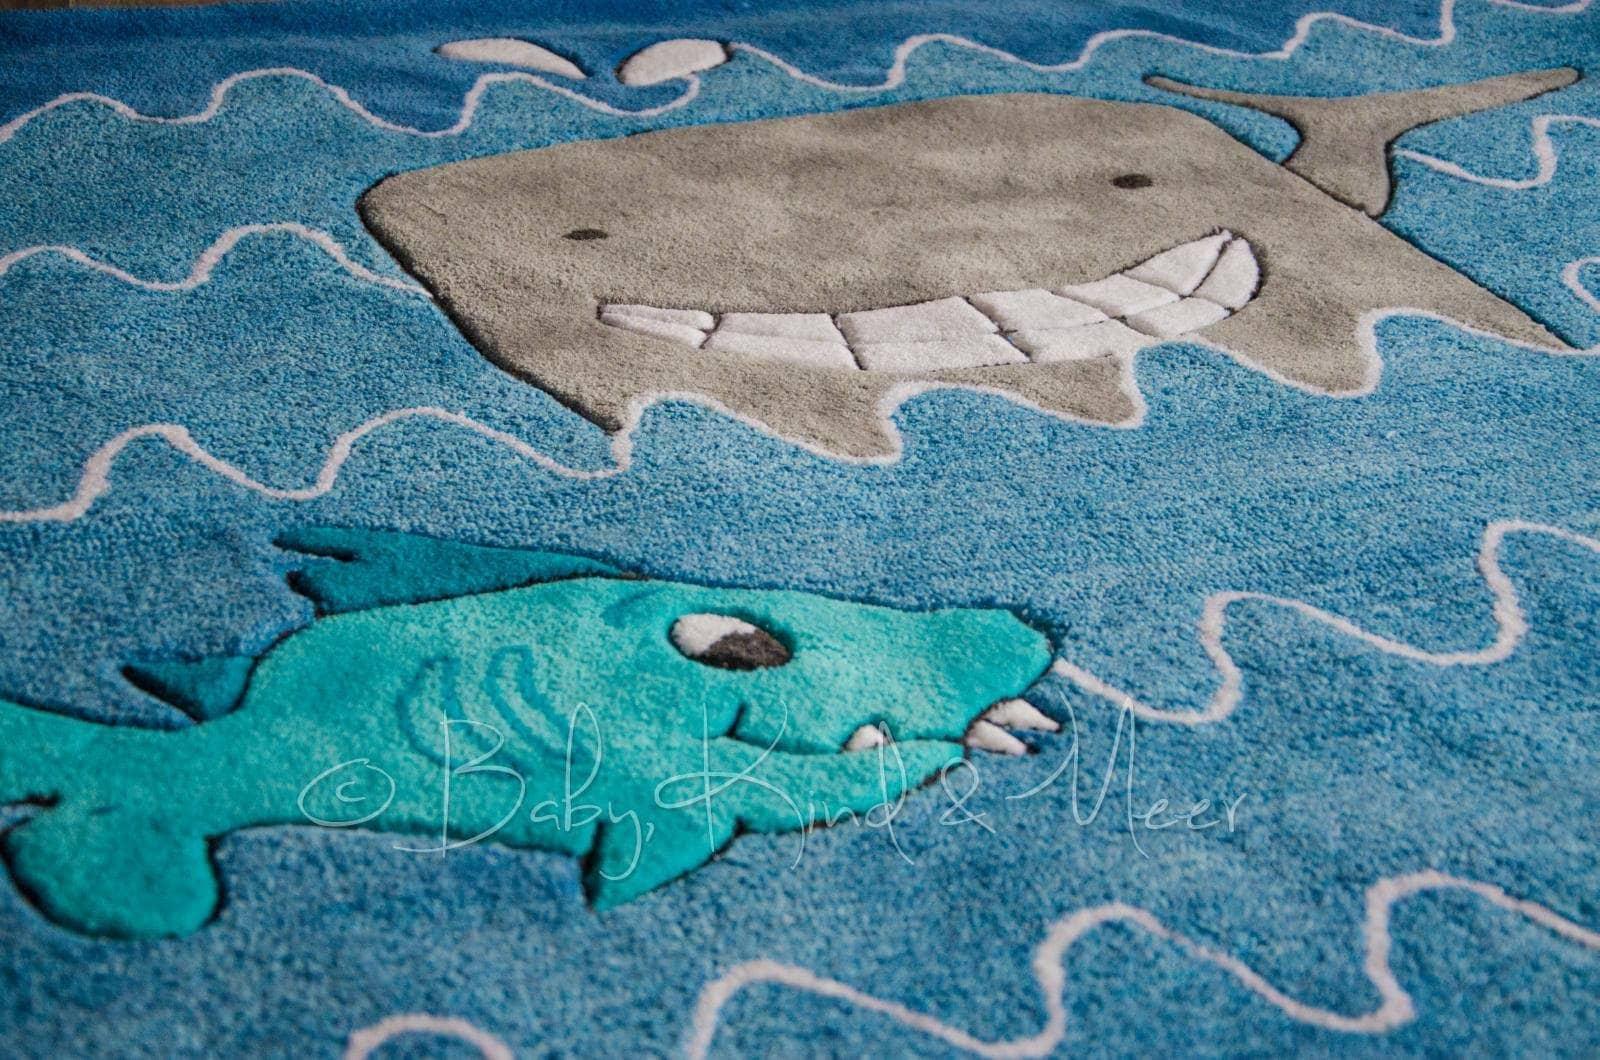 Full Size of Lieblingsteppiche Kinderzimmer Co Baby Regale Regal Weiß Sofa Kinderzimmer Teppichboden Kinderzimmer